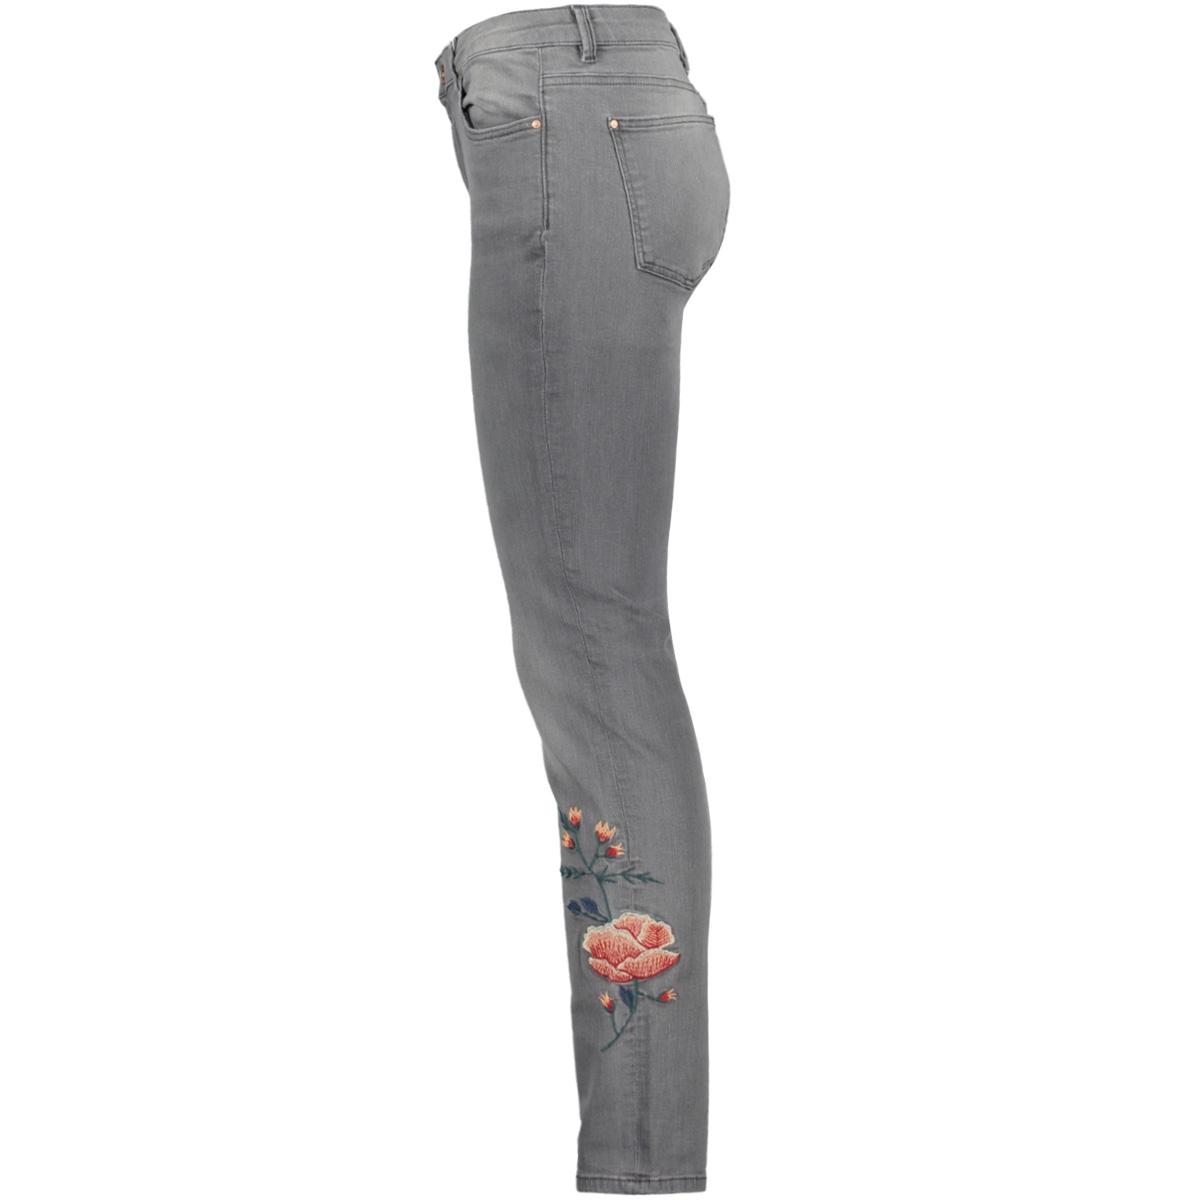 127cc1b003 edc jeans c922